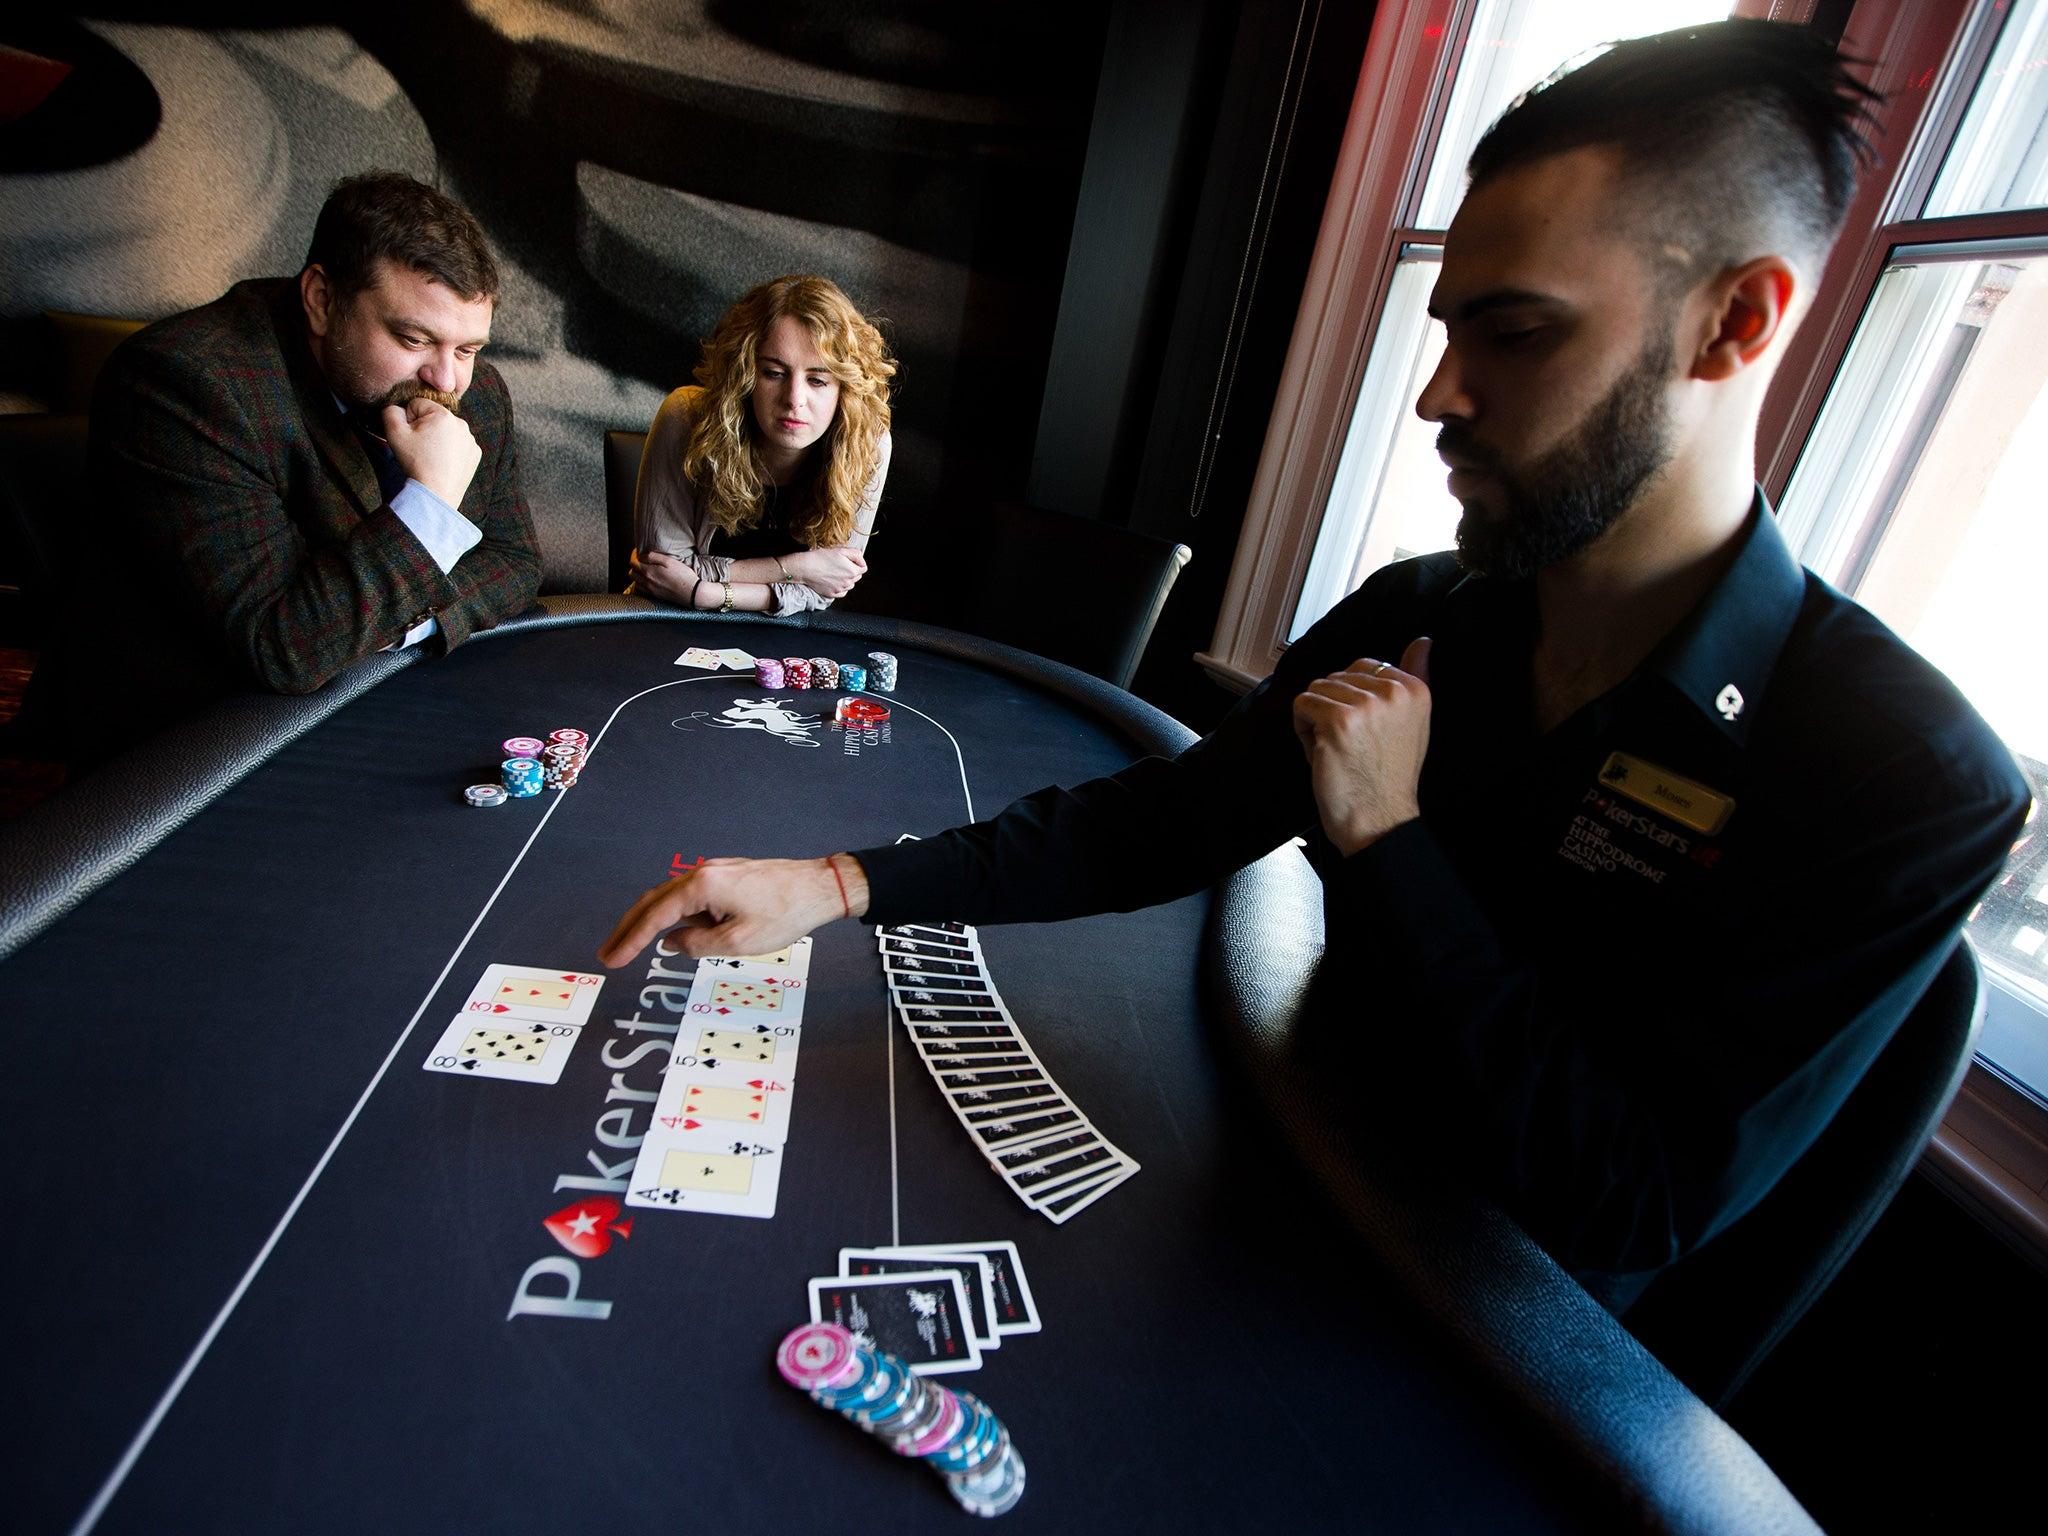 Uk poker tax laws rent craps table michigan